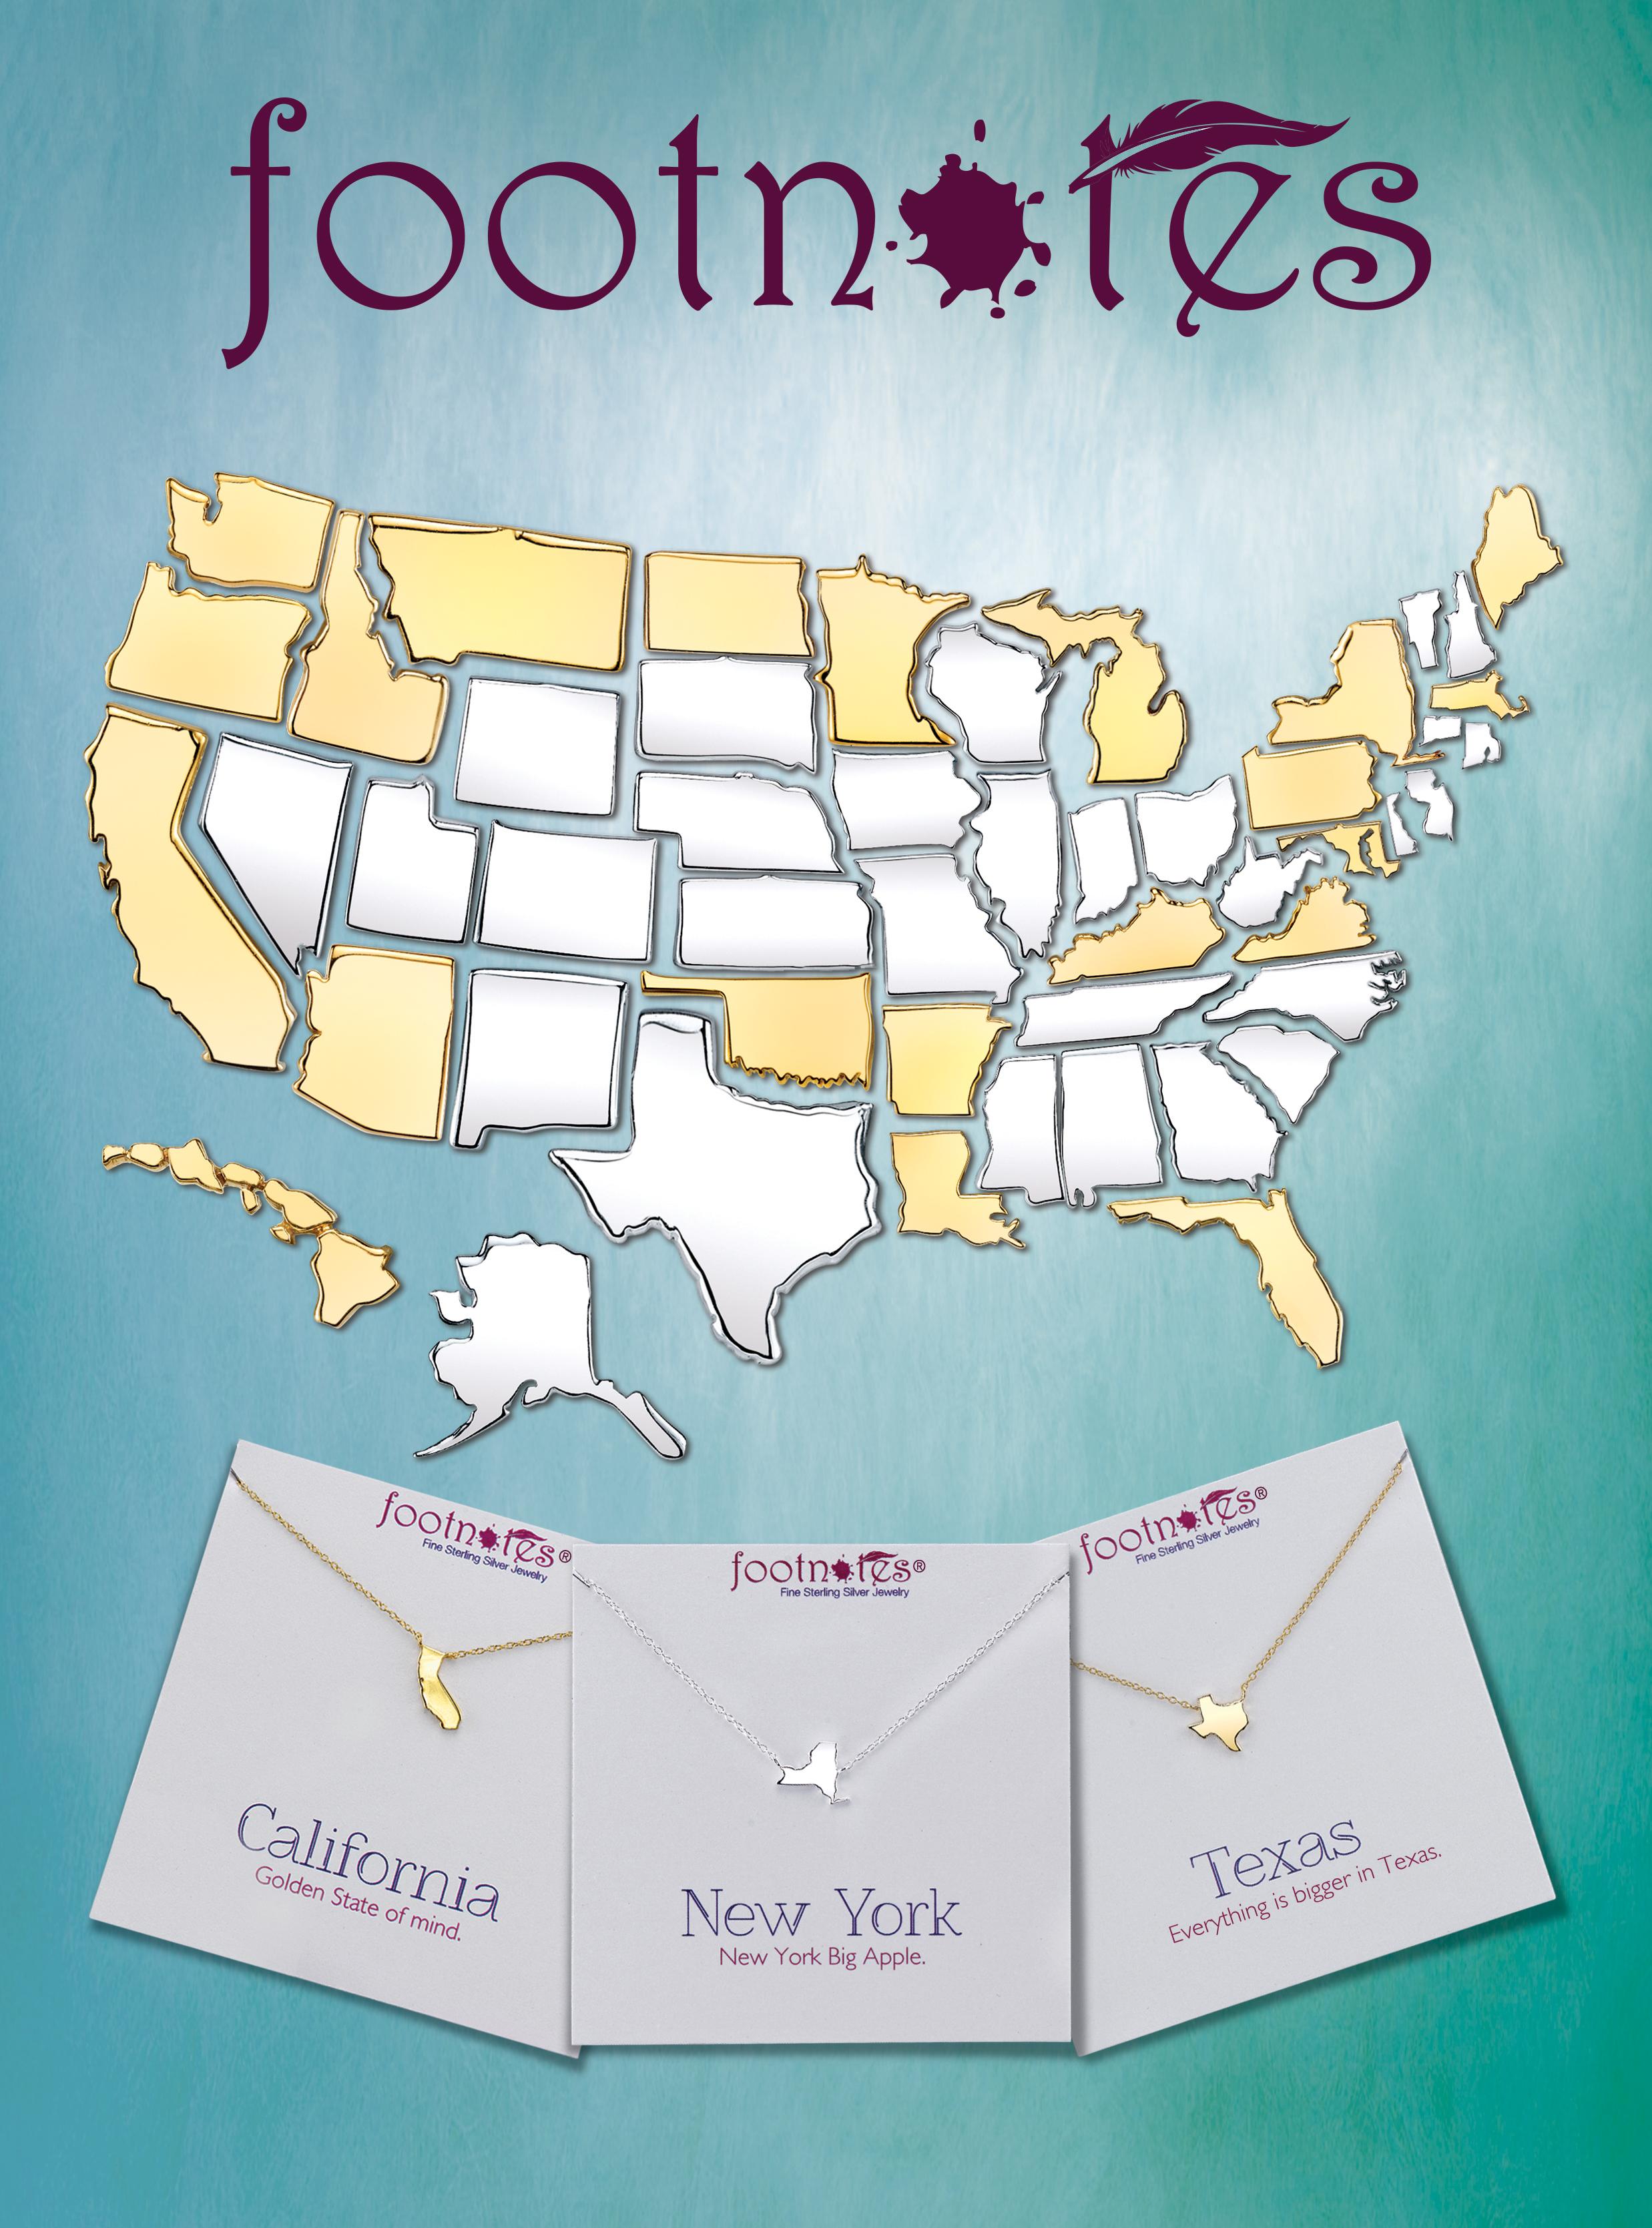 magazine ad, jewelry, pendant, light, united states, states, usa, jewelry ad, creative jewelry ad